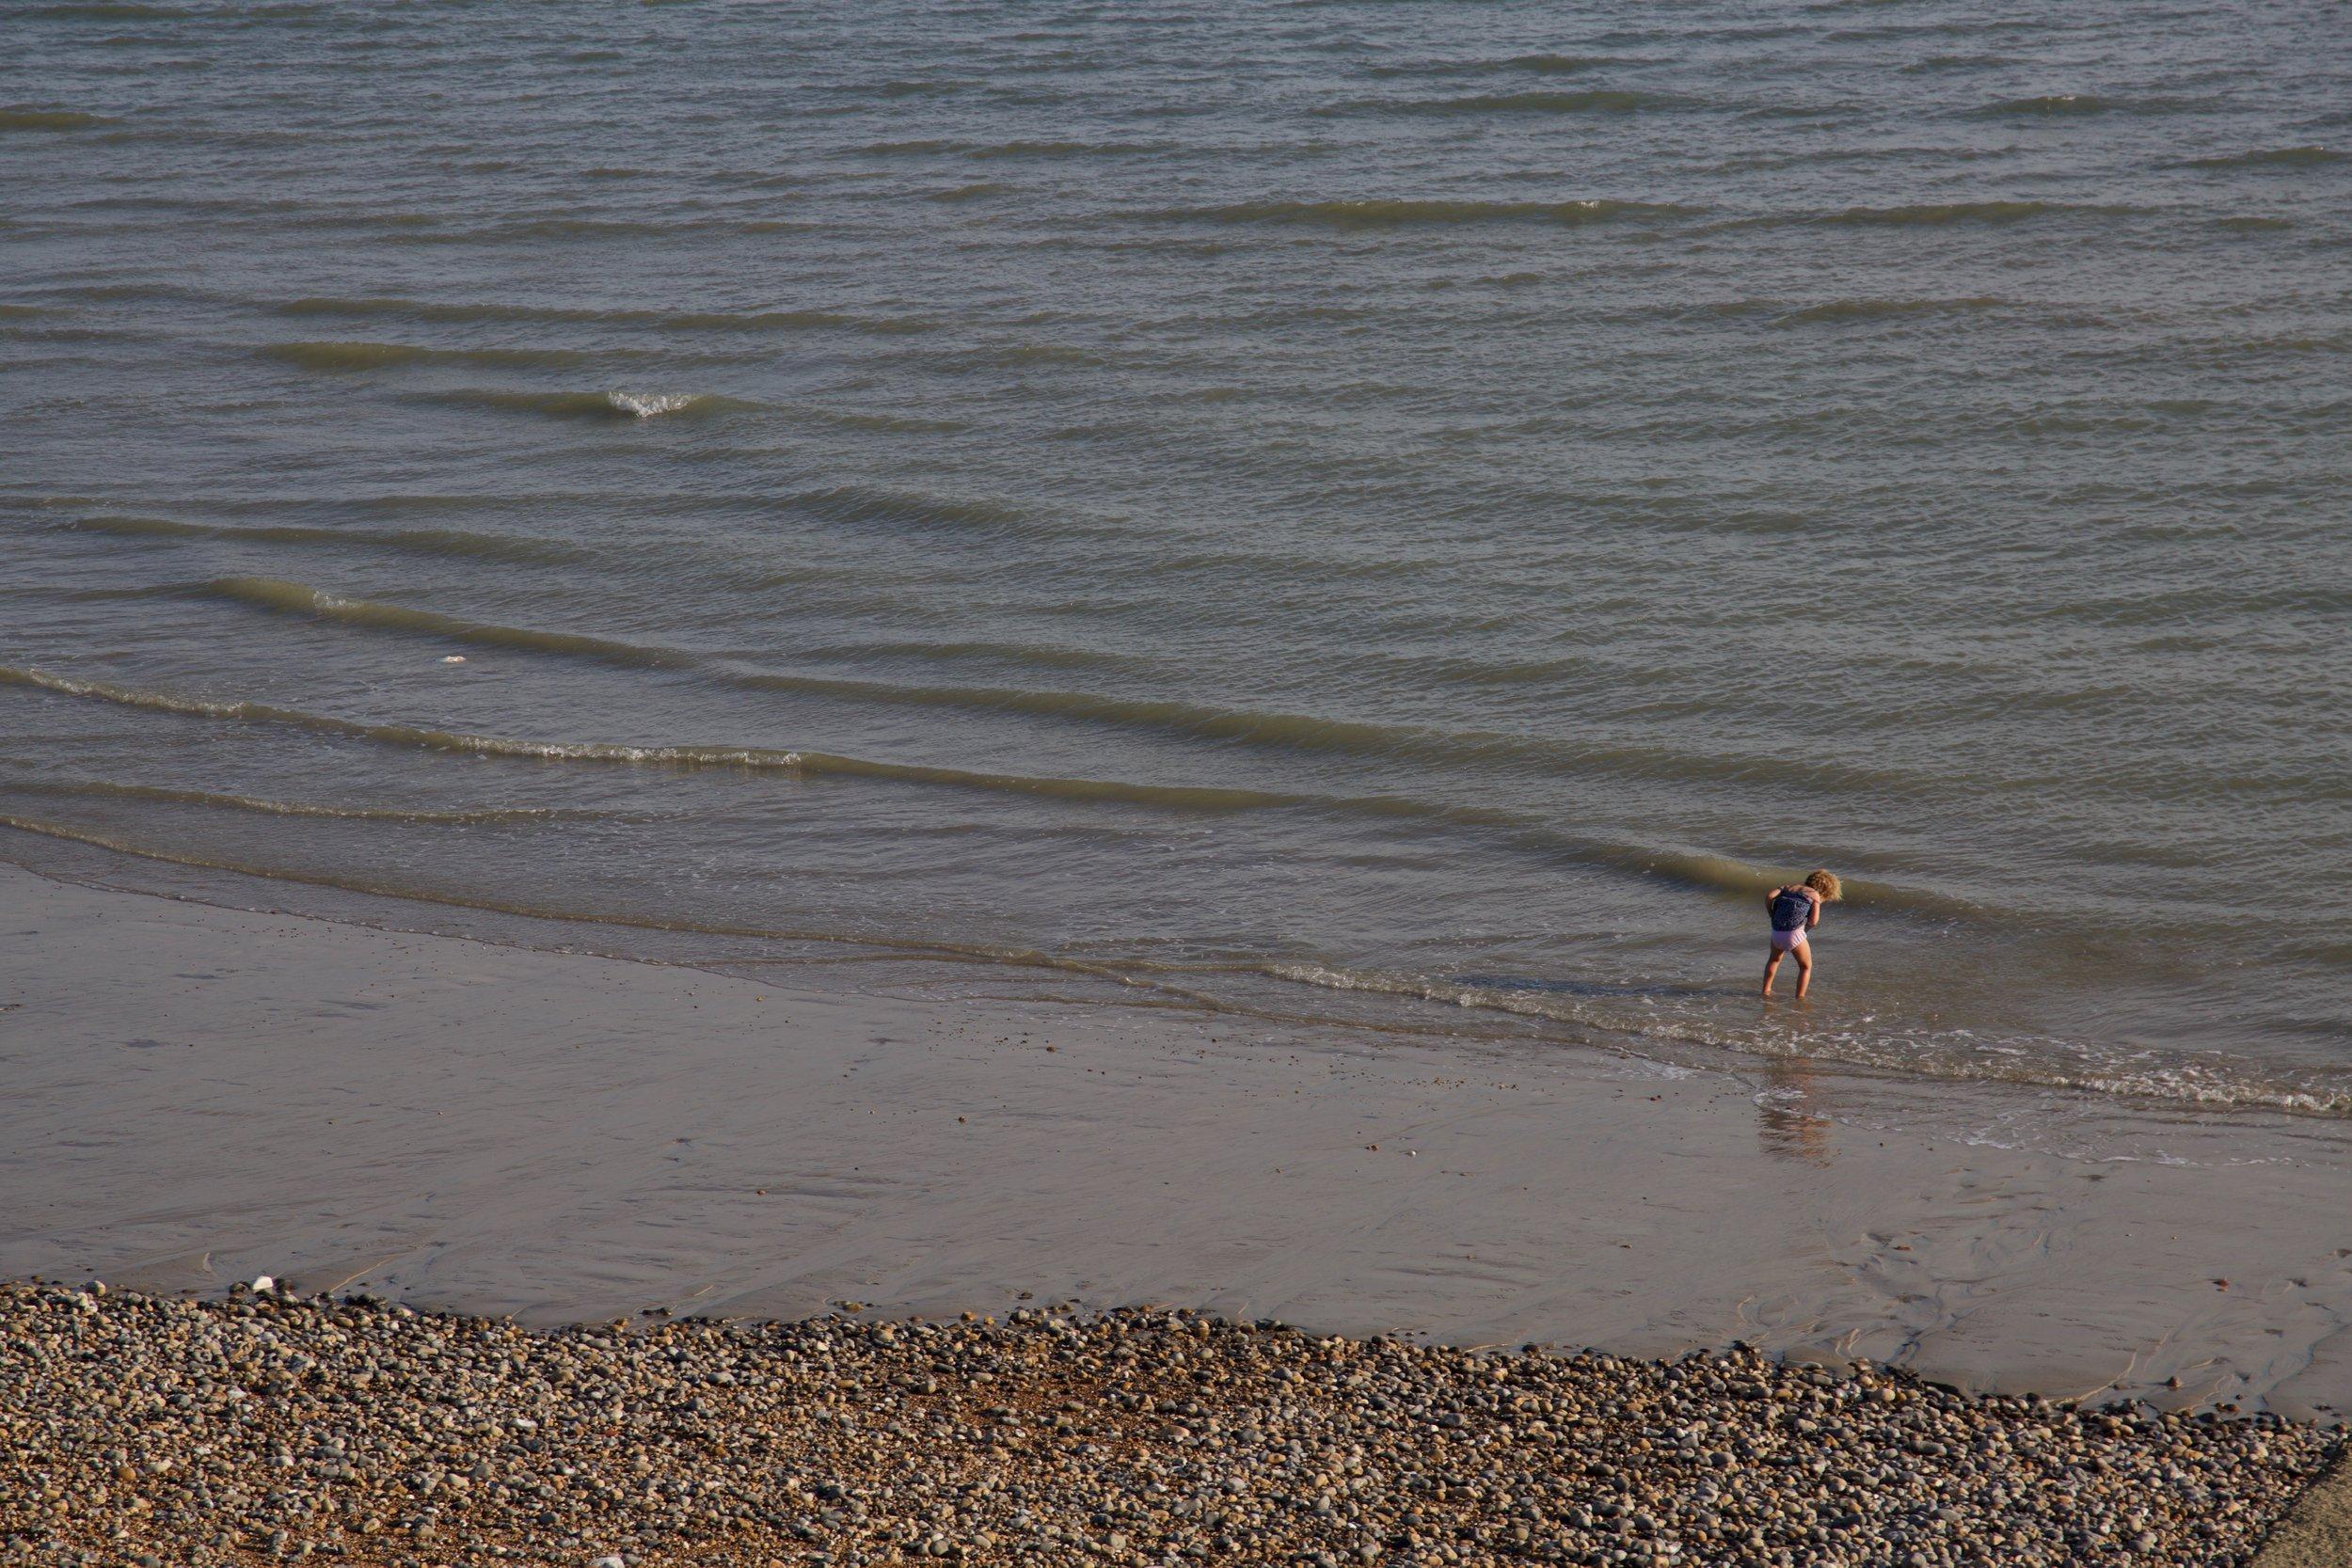 Child on the Coast, 2015 (Brighton)